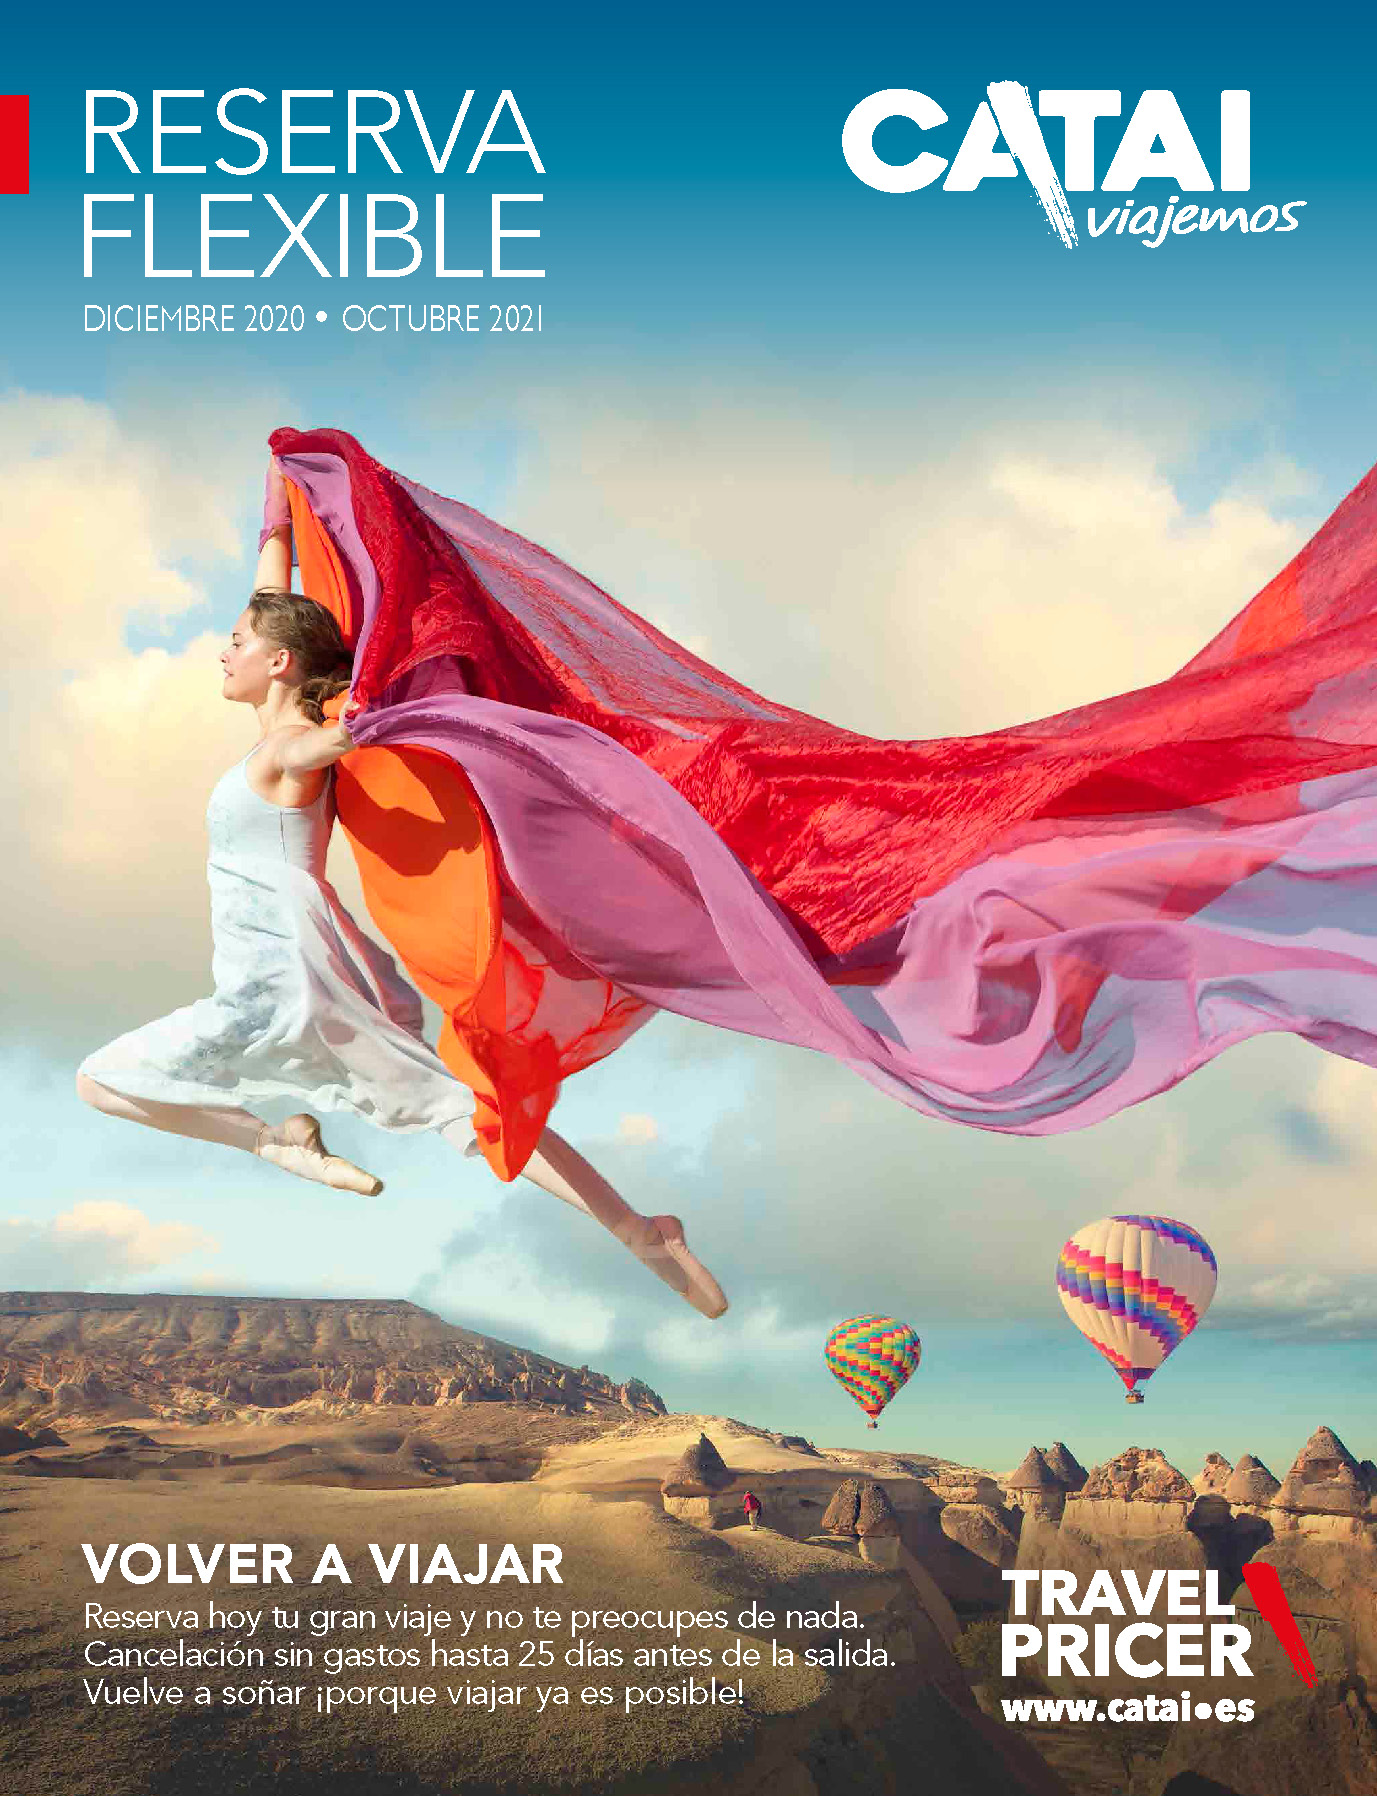 Catalogo Catai Reserva Flexible 2020-2021